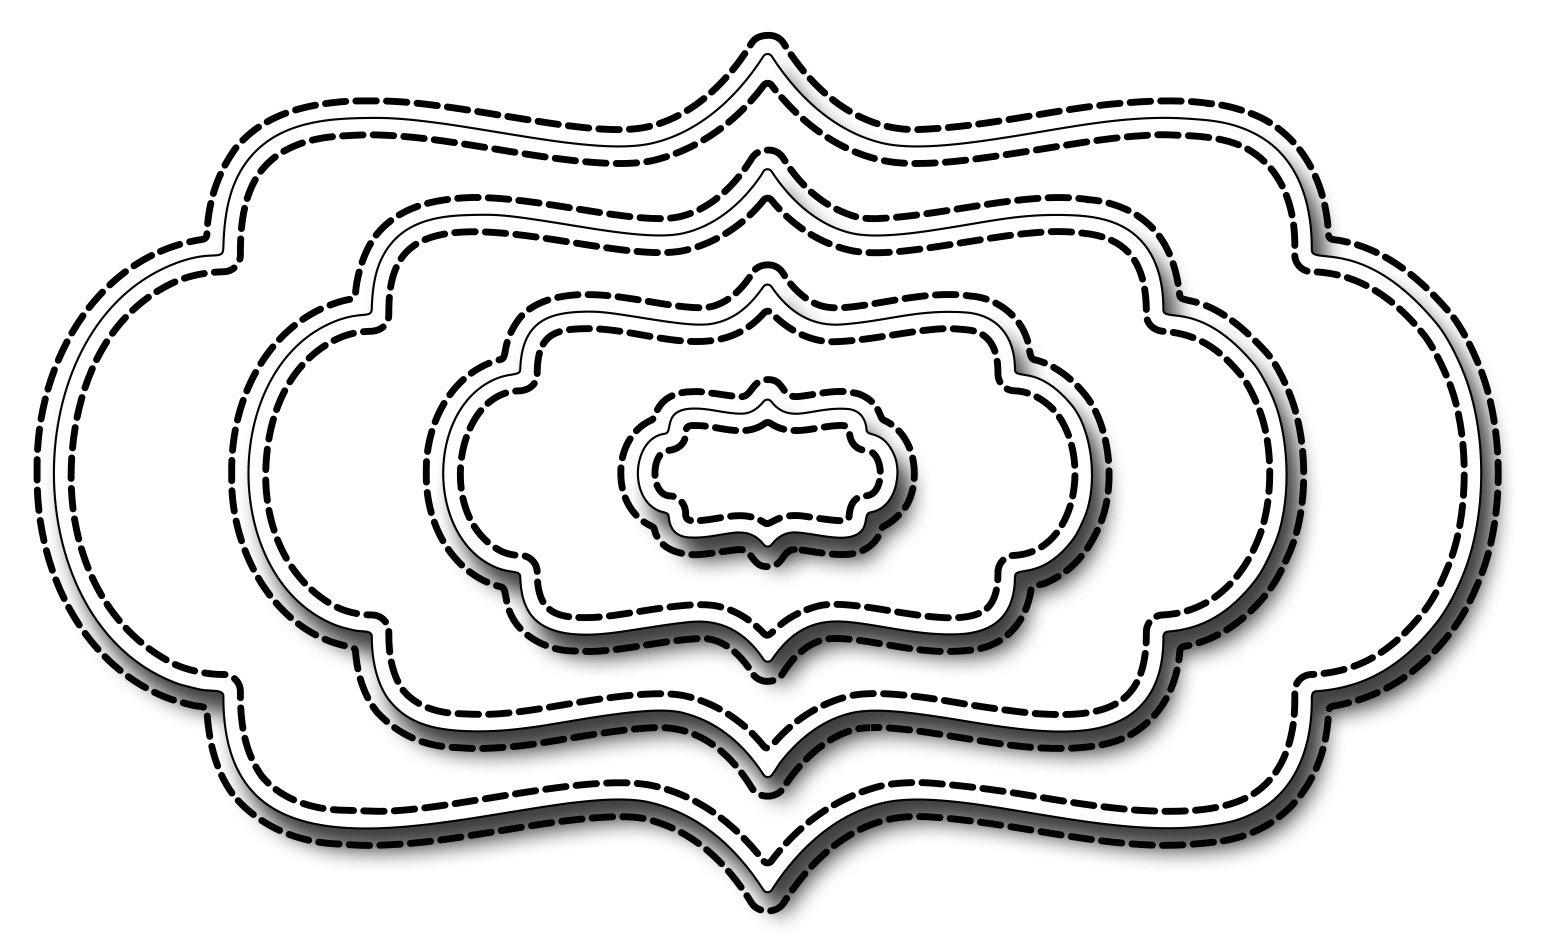 Nested Stitched Bracket Labels